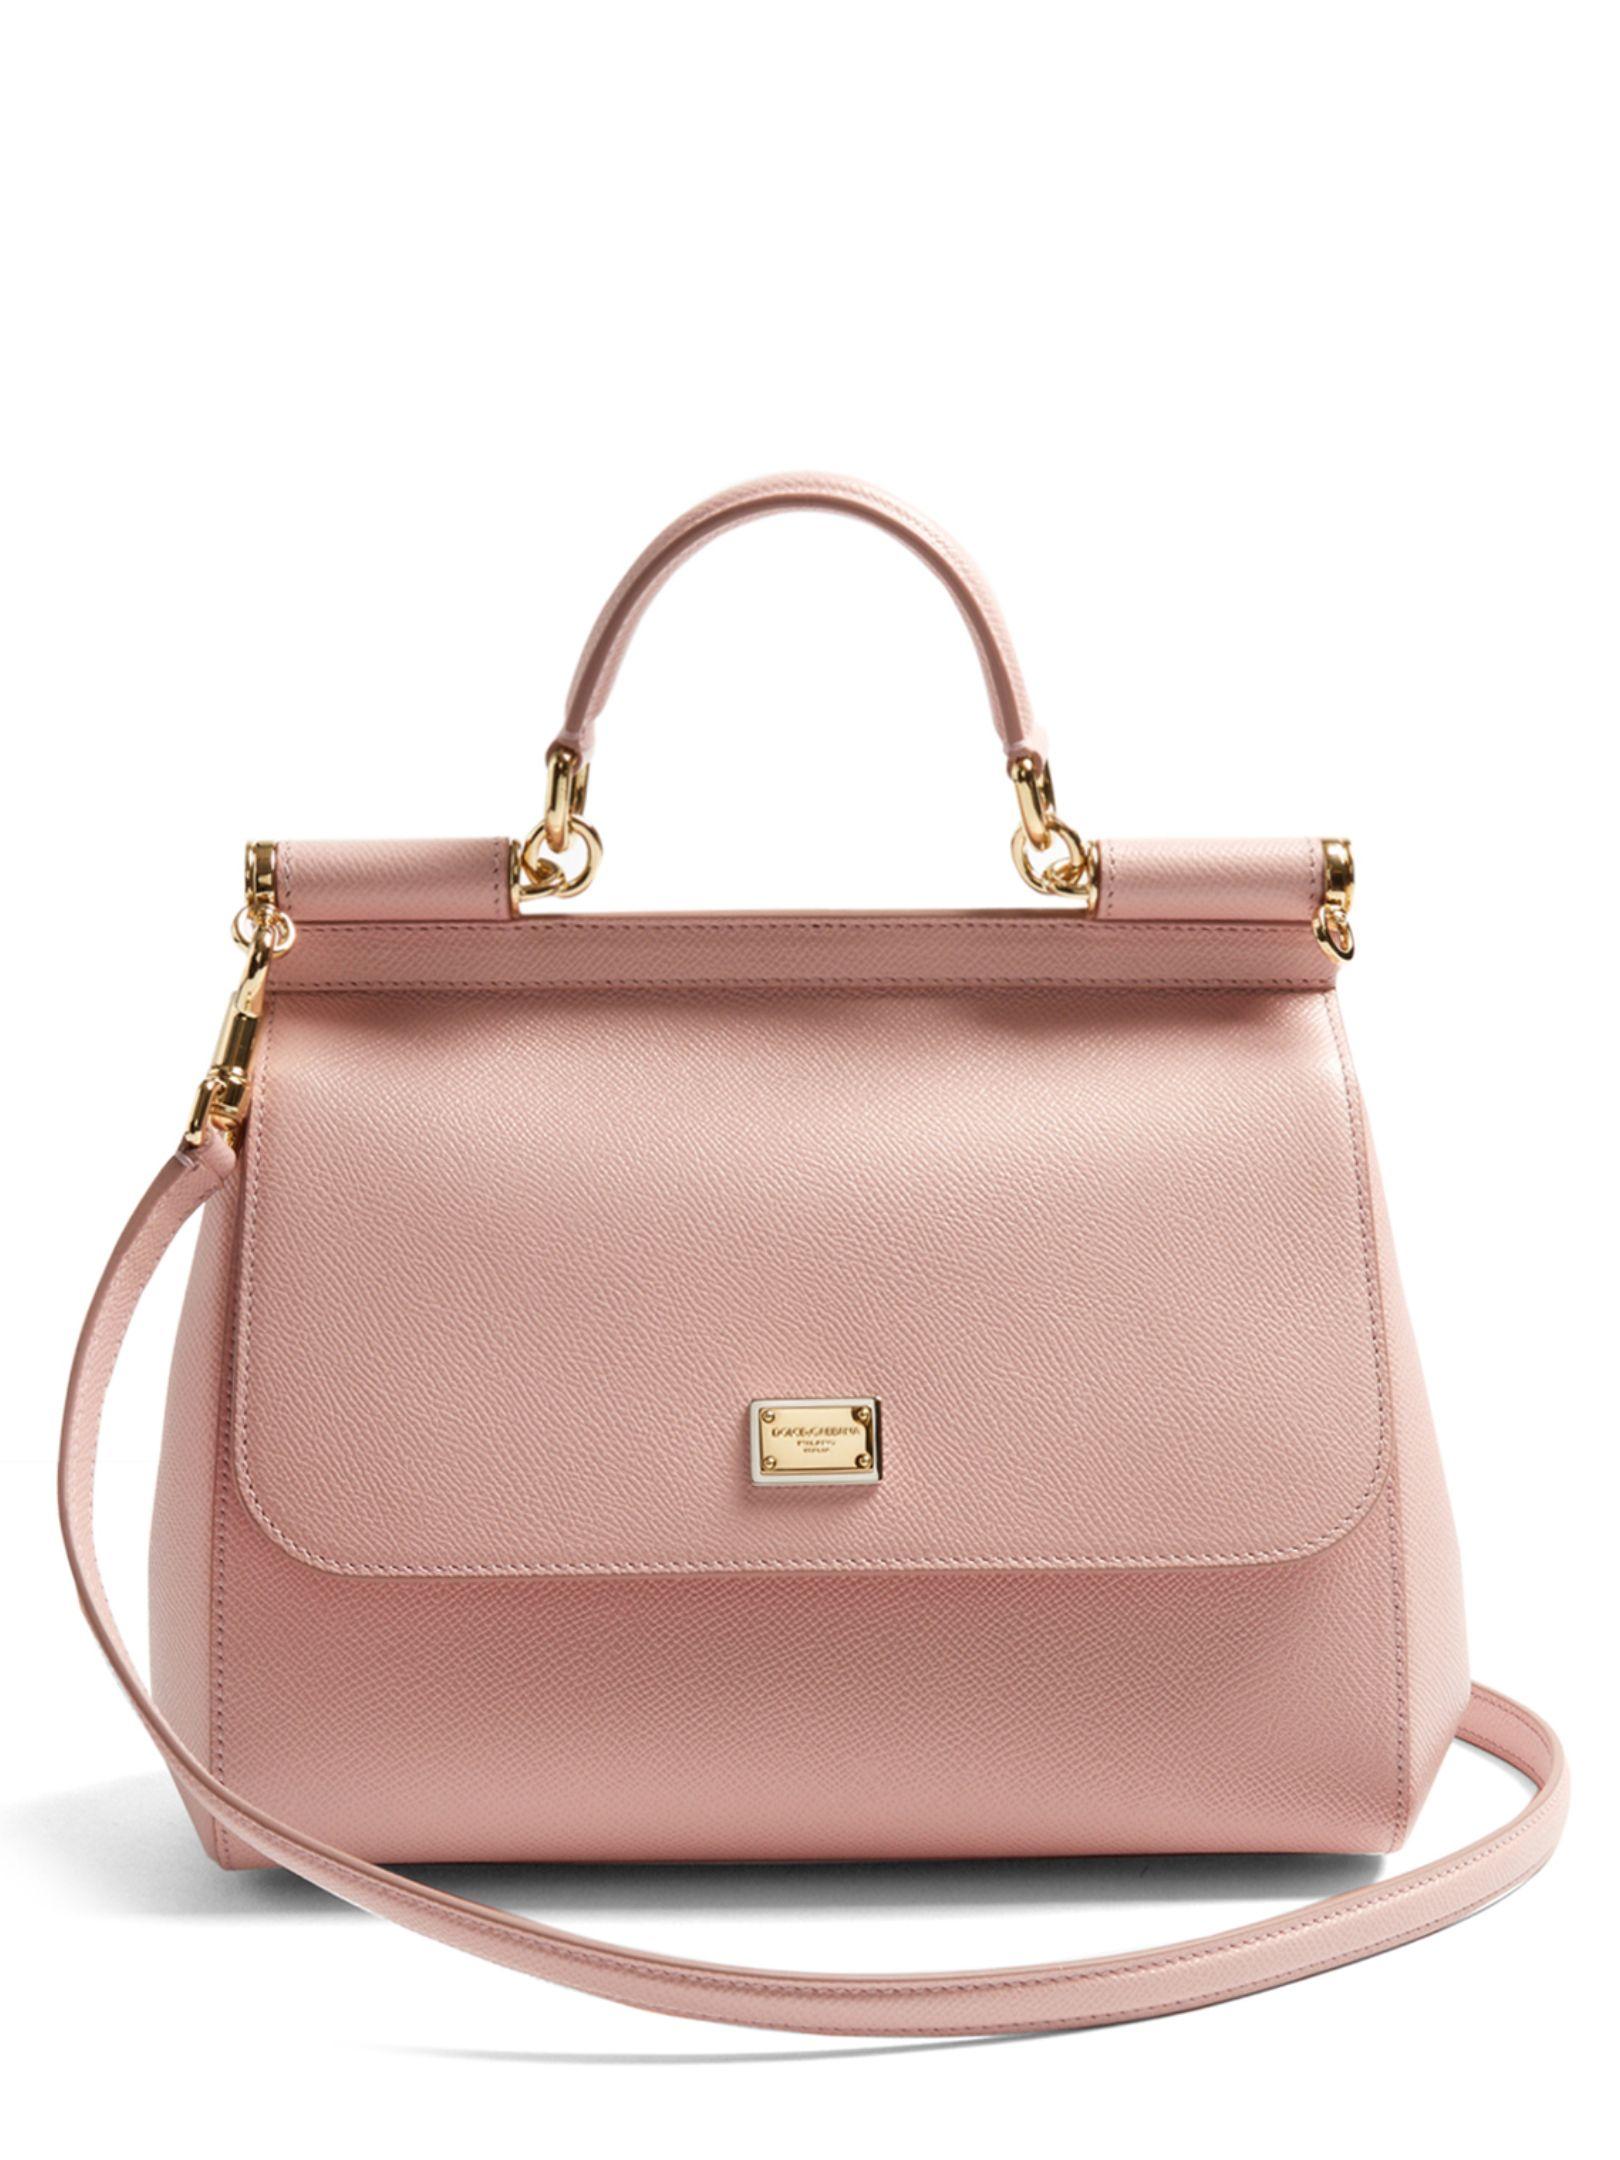 9ee59456d8 Sicily medium leather bag